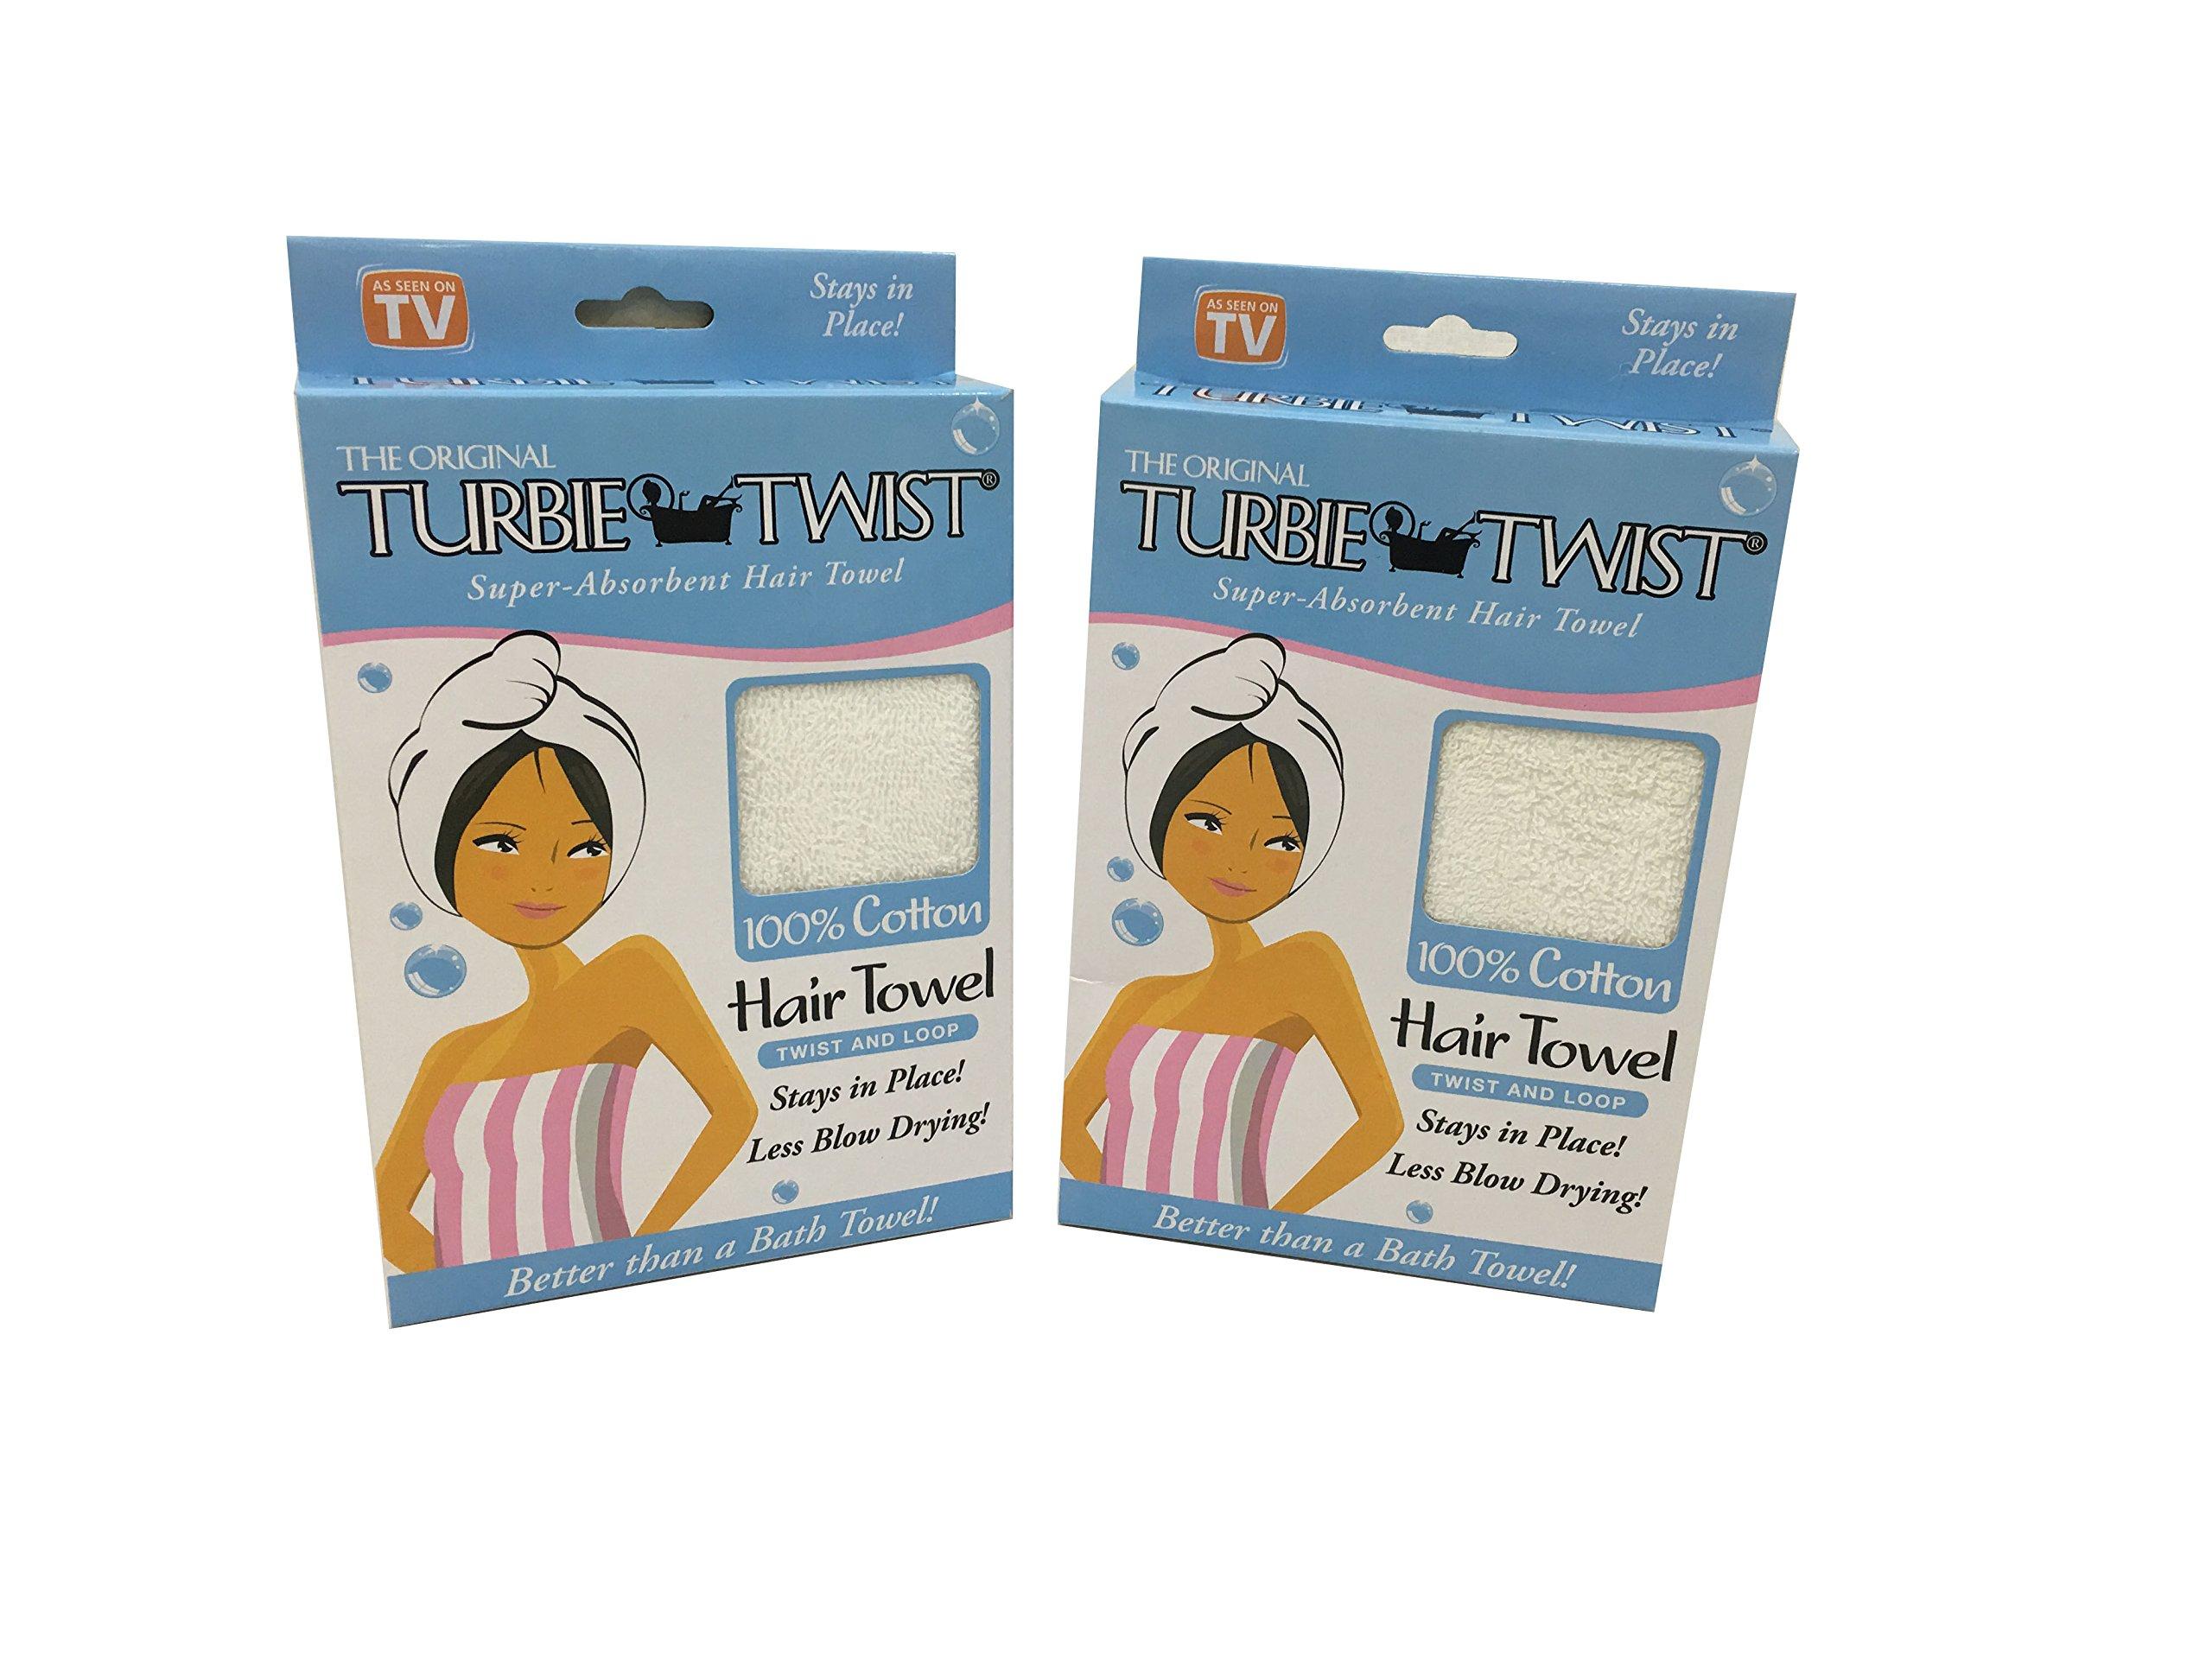 Turbie Twist White Super-absorbent Hair Towel cotton (2) by Turbie Twist